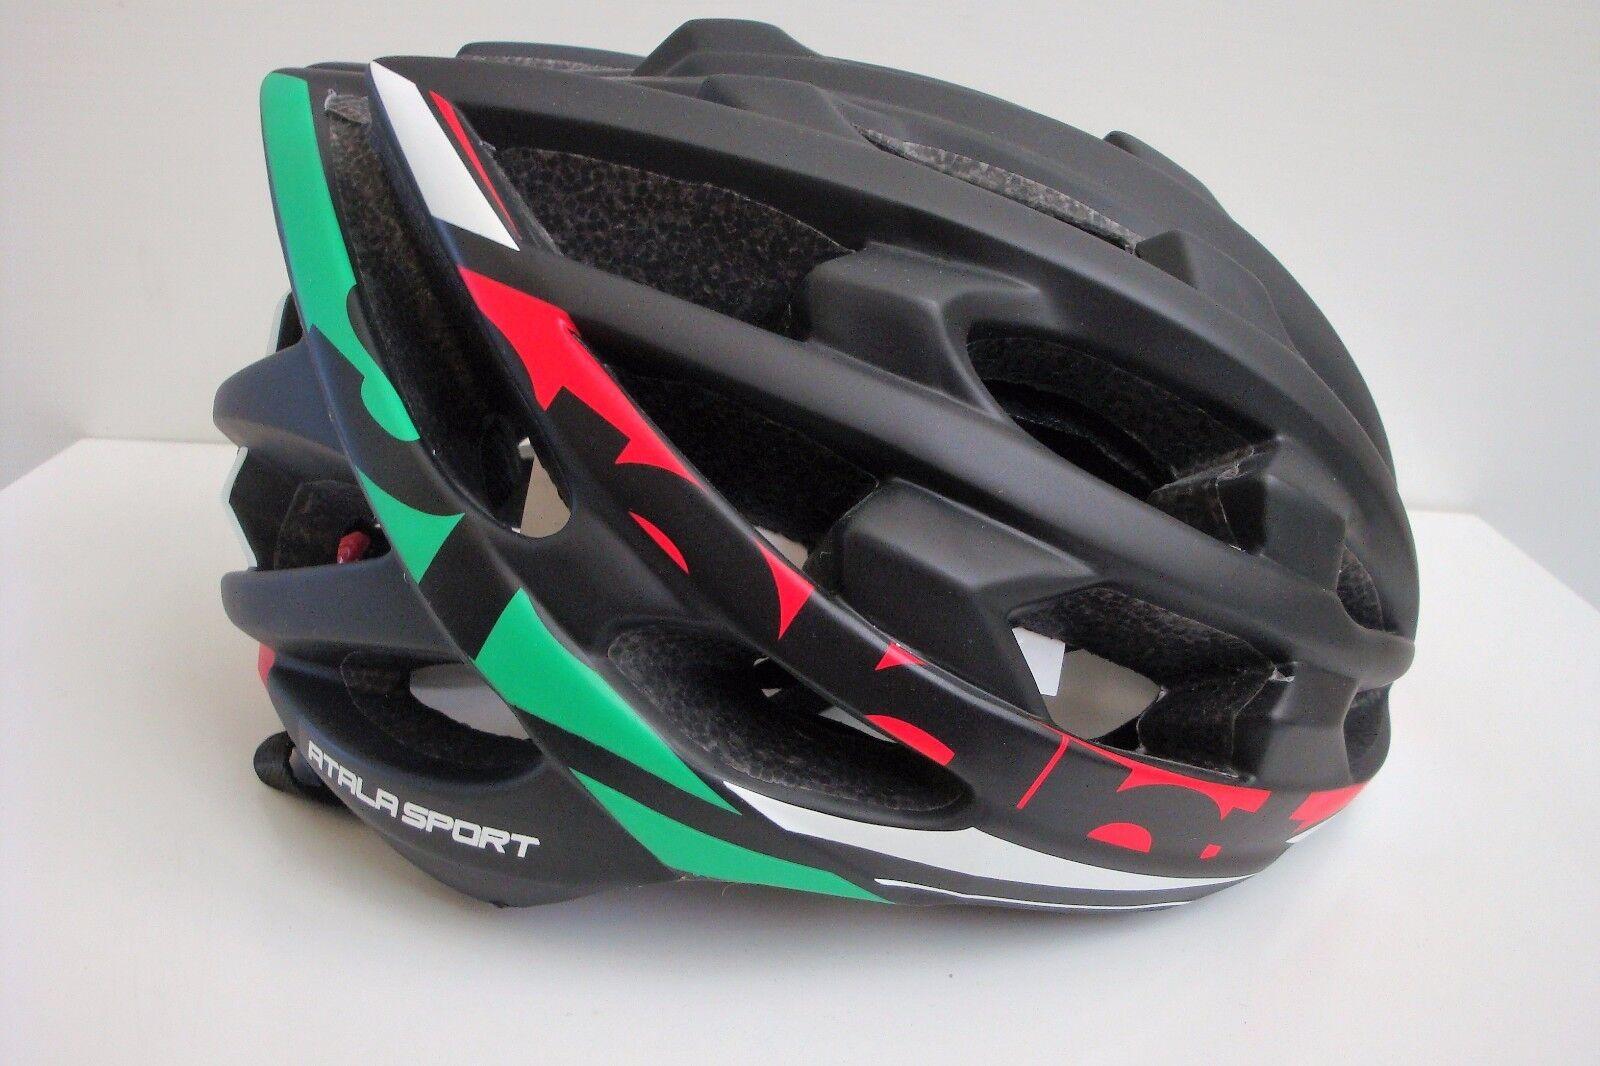 Casco Bici Atala Sport mod. Sprint Italia col. black Tricolor Tg. M (55-58)